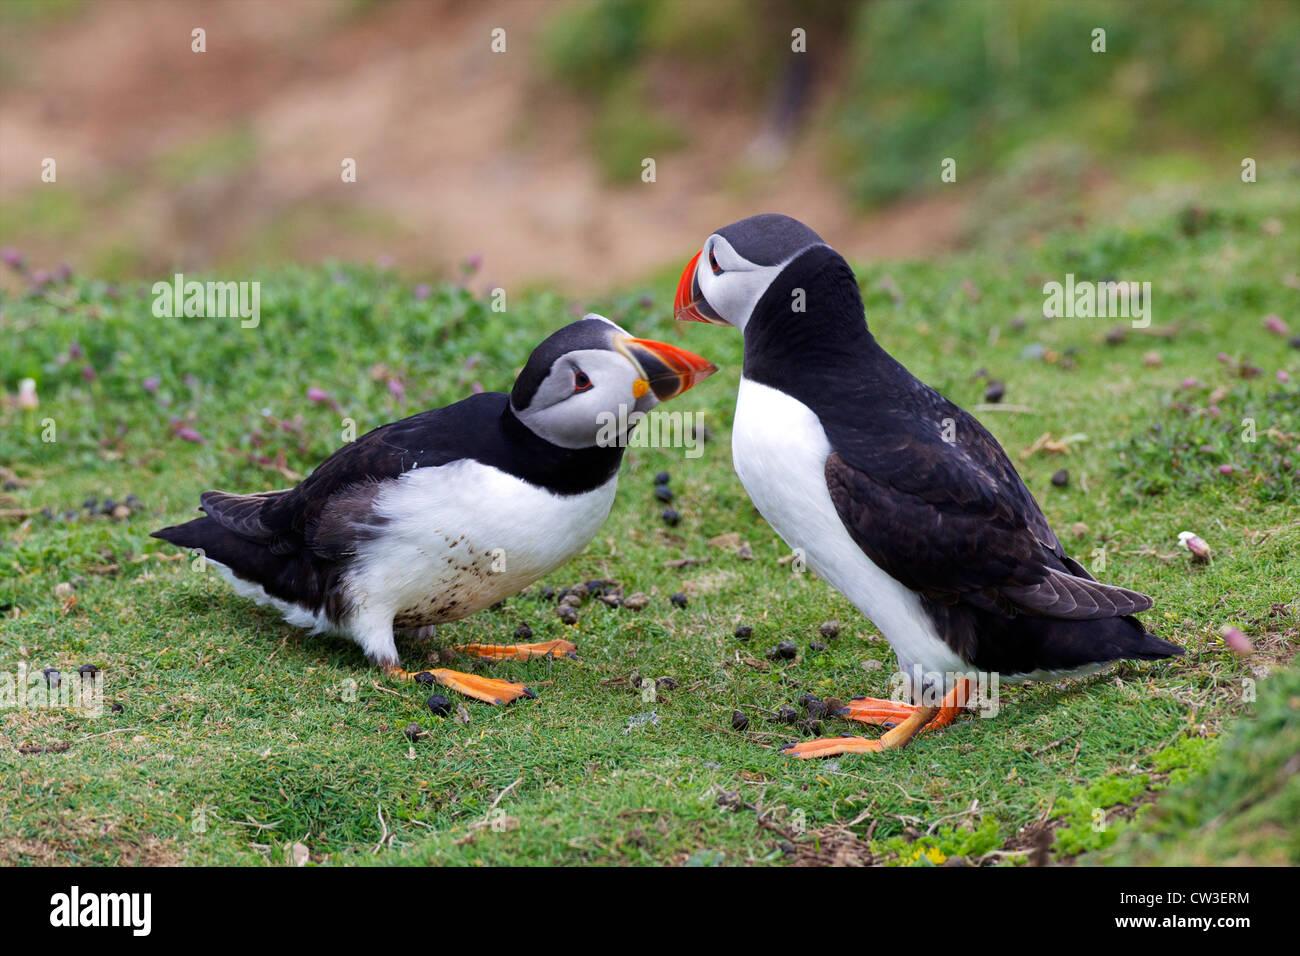 Courtship ritual of mating puffins on Skomer Island, Pembrokeshire National Park, Wales, Cymru, United Kingdom, - Stock Image